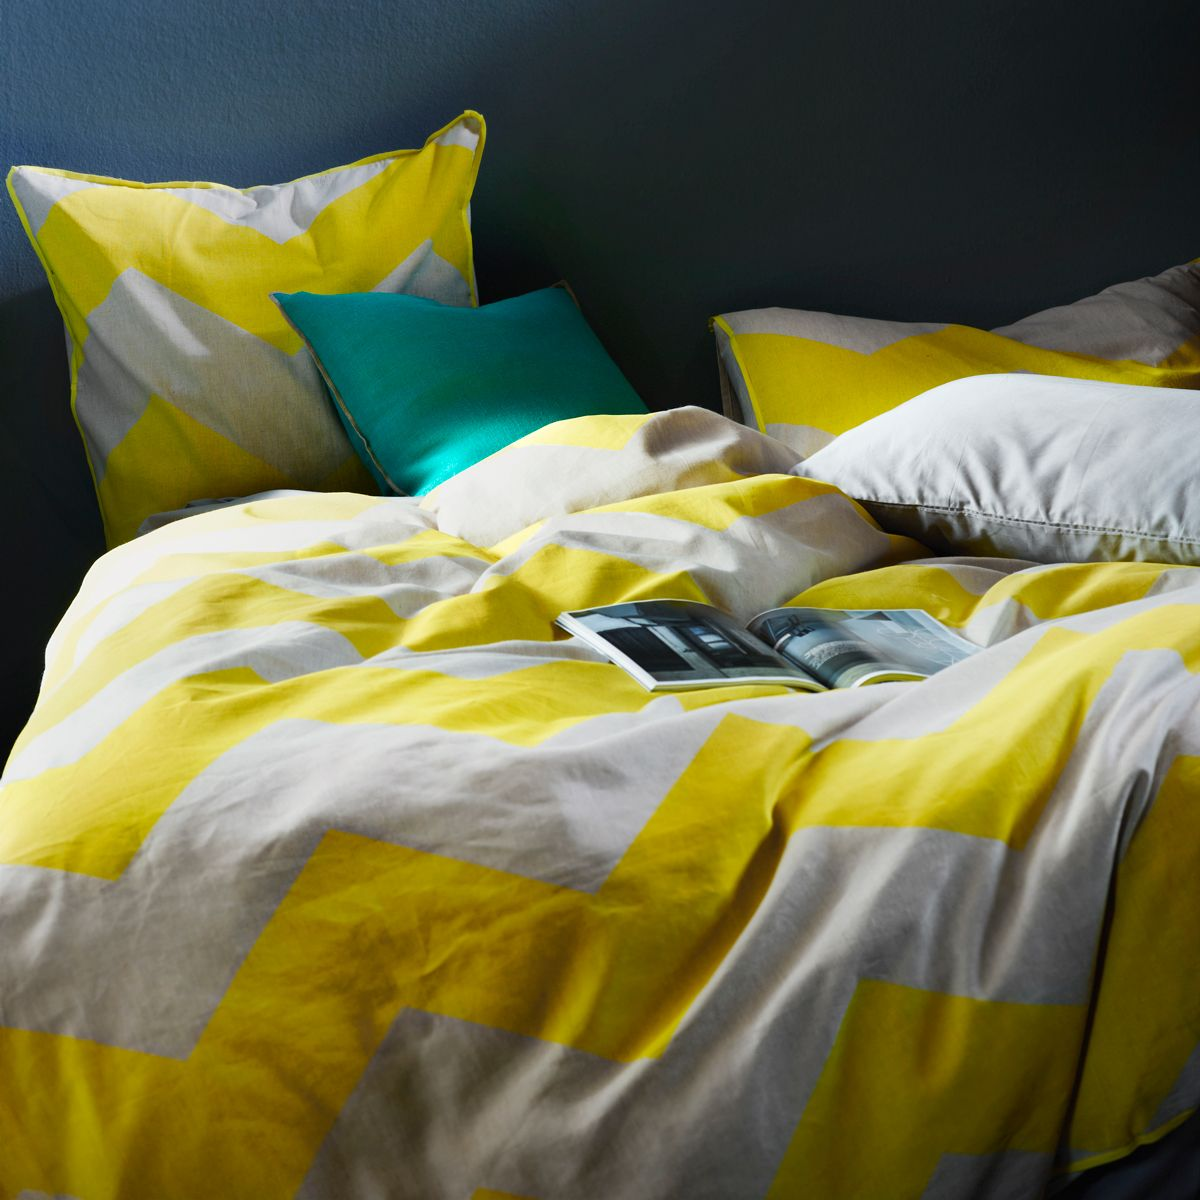 AURA Chevron Grande in Bright Yellow | AURA Home Bedlinen ... : bright yellow quilt - Adamdwight.com